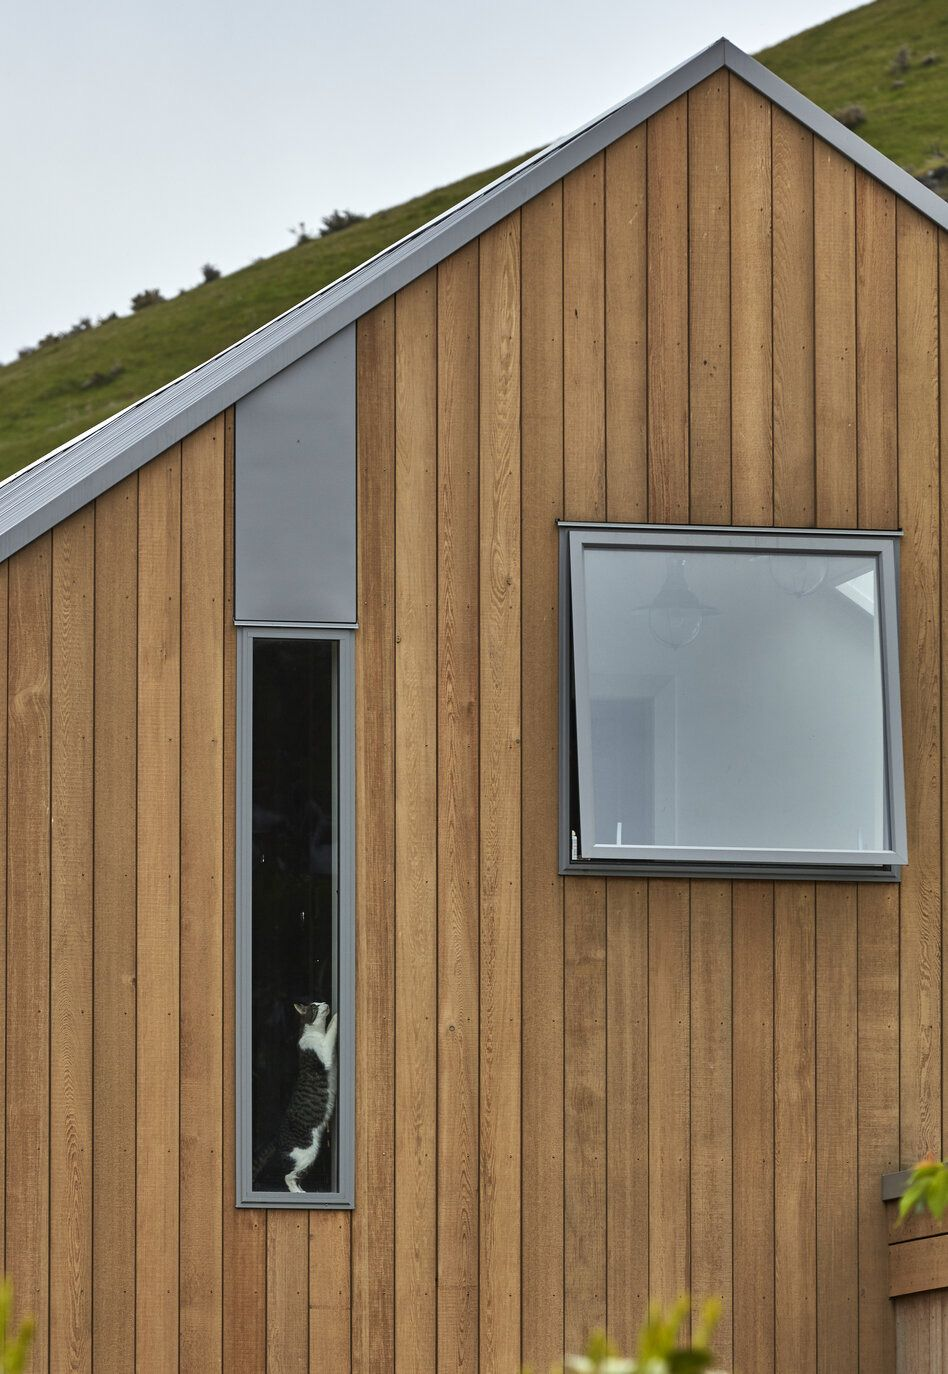 Sip Panel House Plans 2021 Sips Panels Passive House Design Sip House